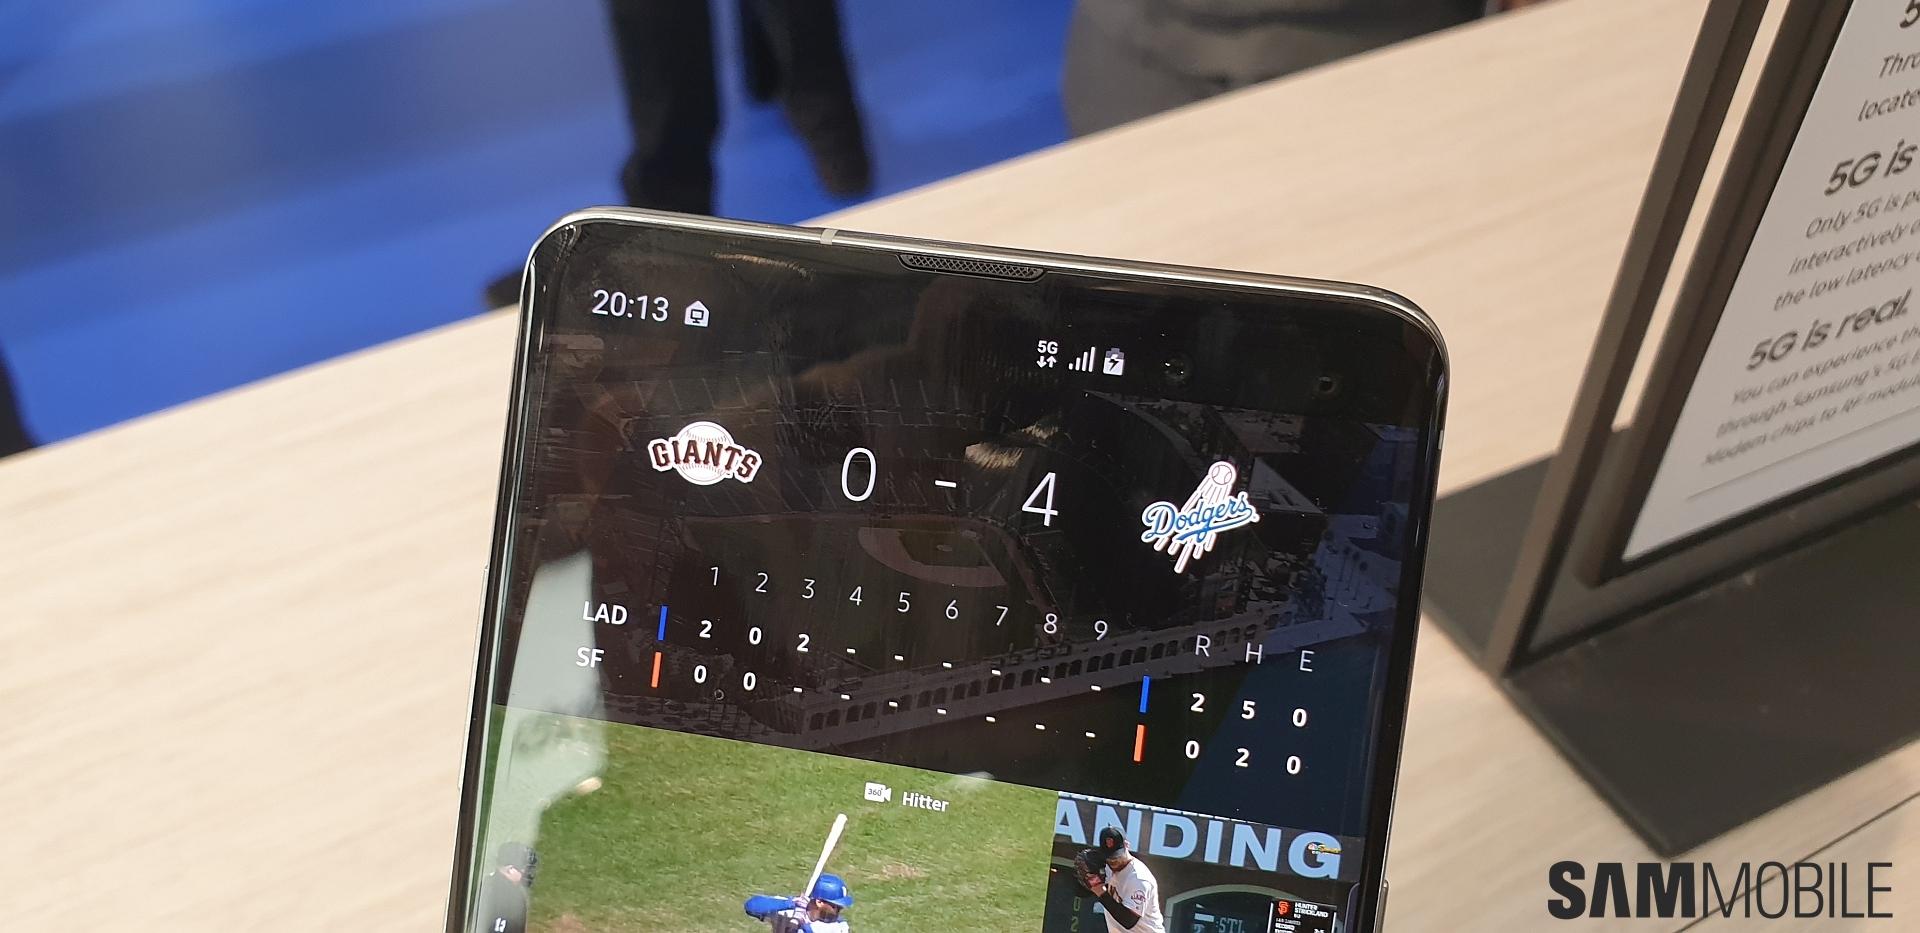 Samsung Galaxy S10 5G hands-on: Bigger is better - SamMobile